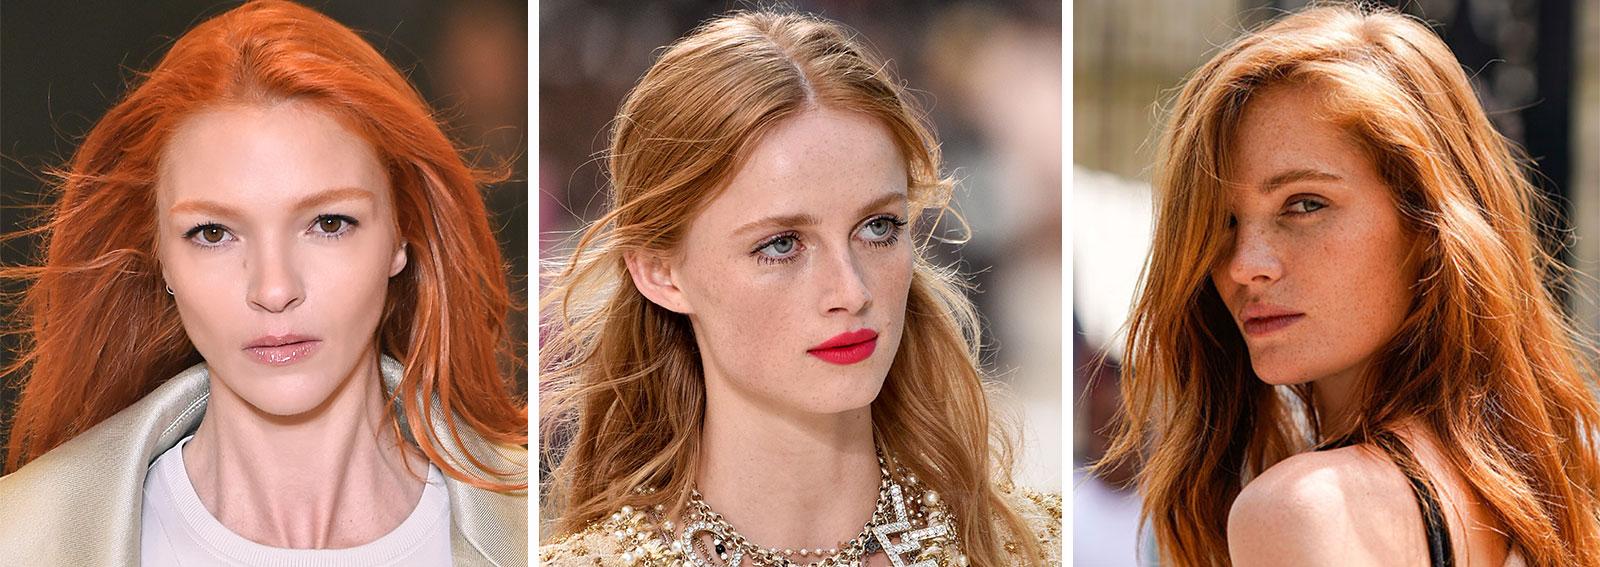 capelli-rossi-modelle-desktop